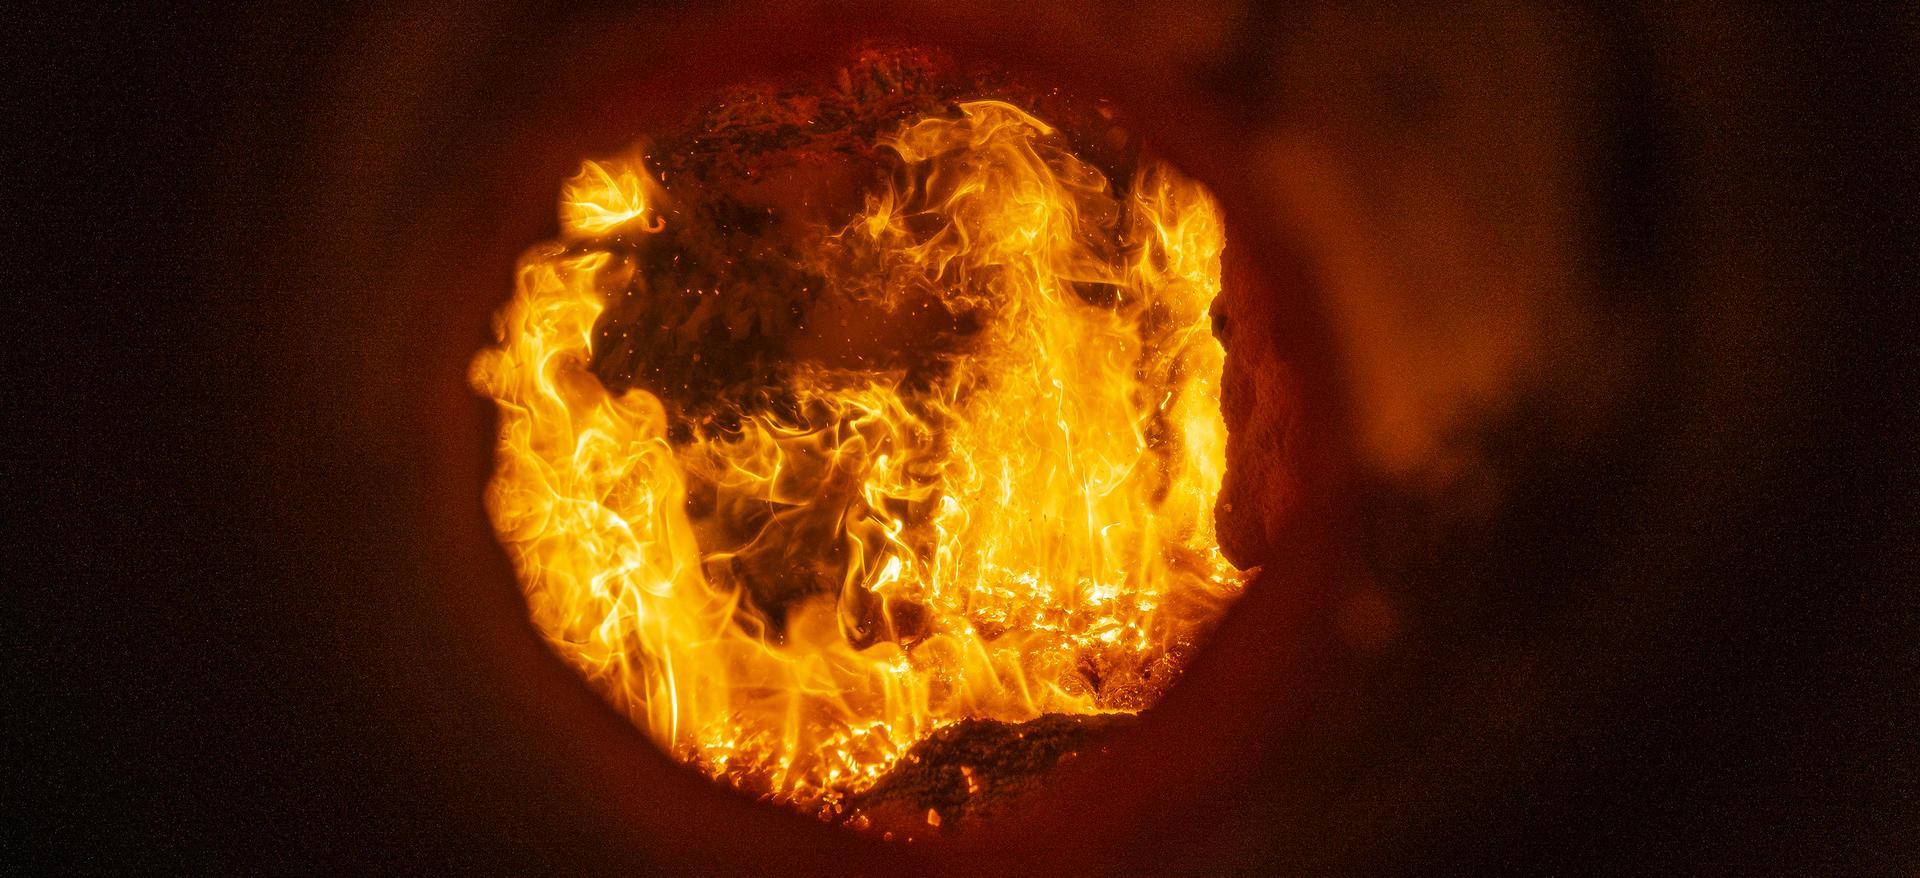 Flammer i ovn